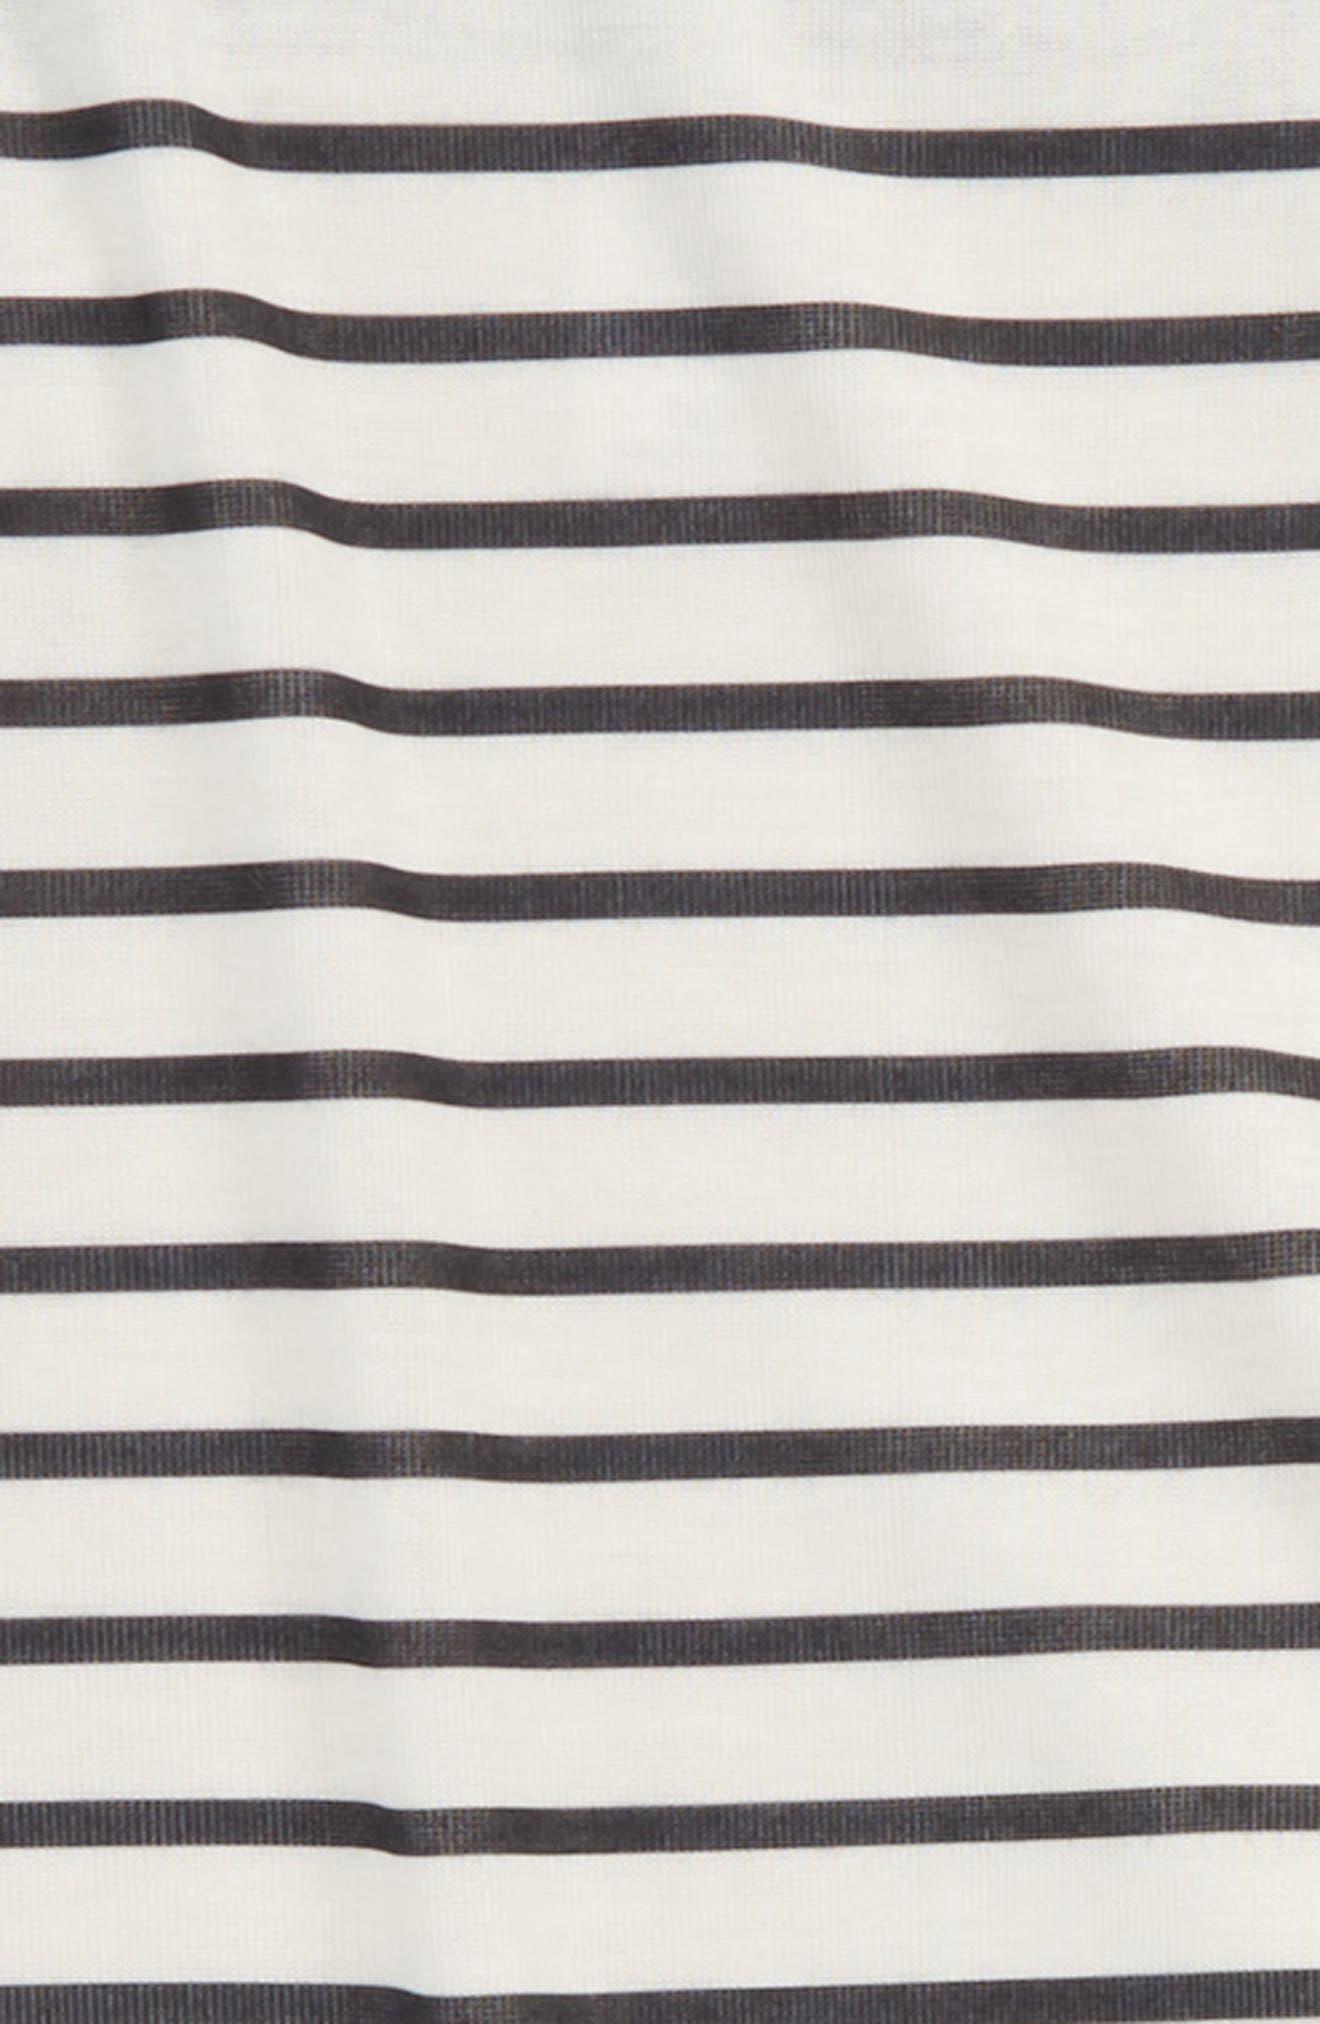 Stripe Two-Piece Pajamas Set,                             Alternate thumbnail 2, color,                             001